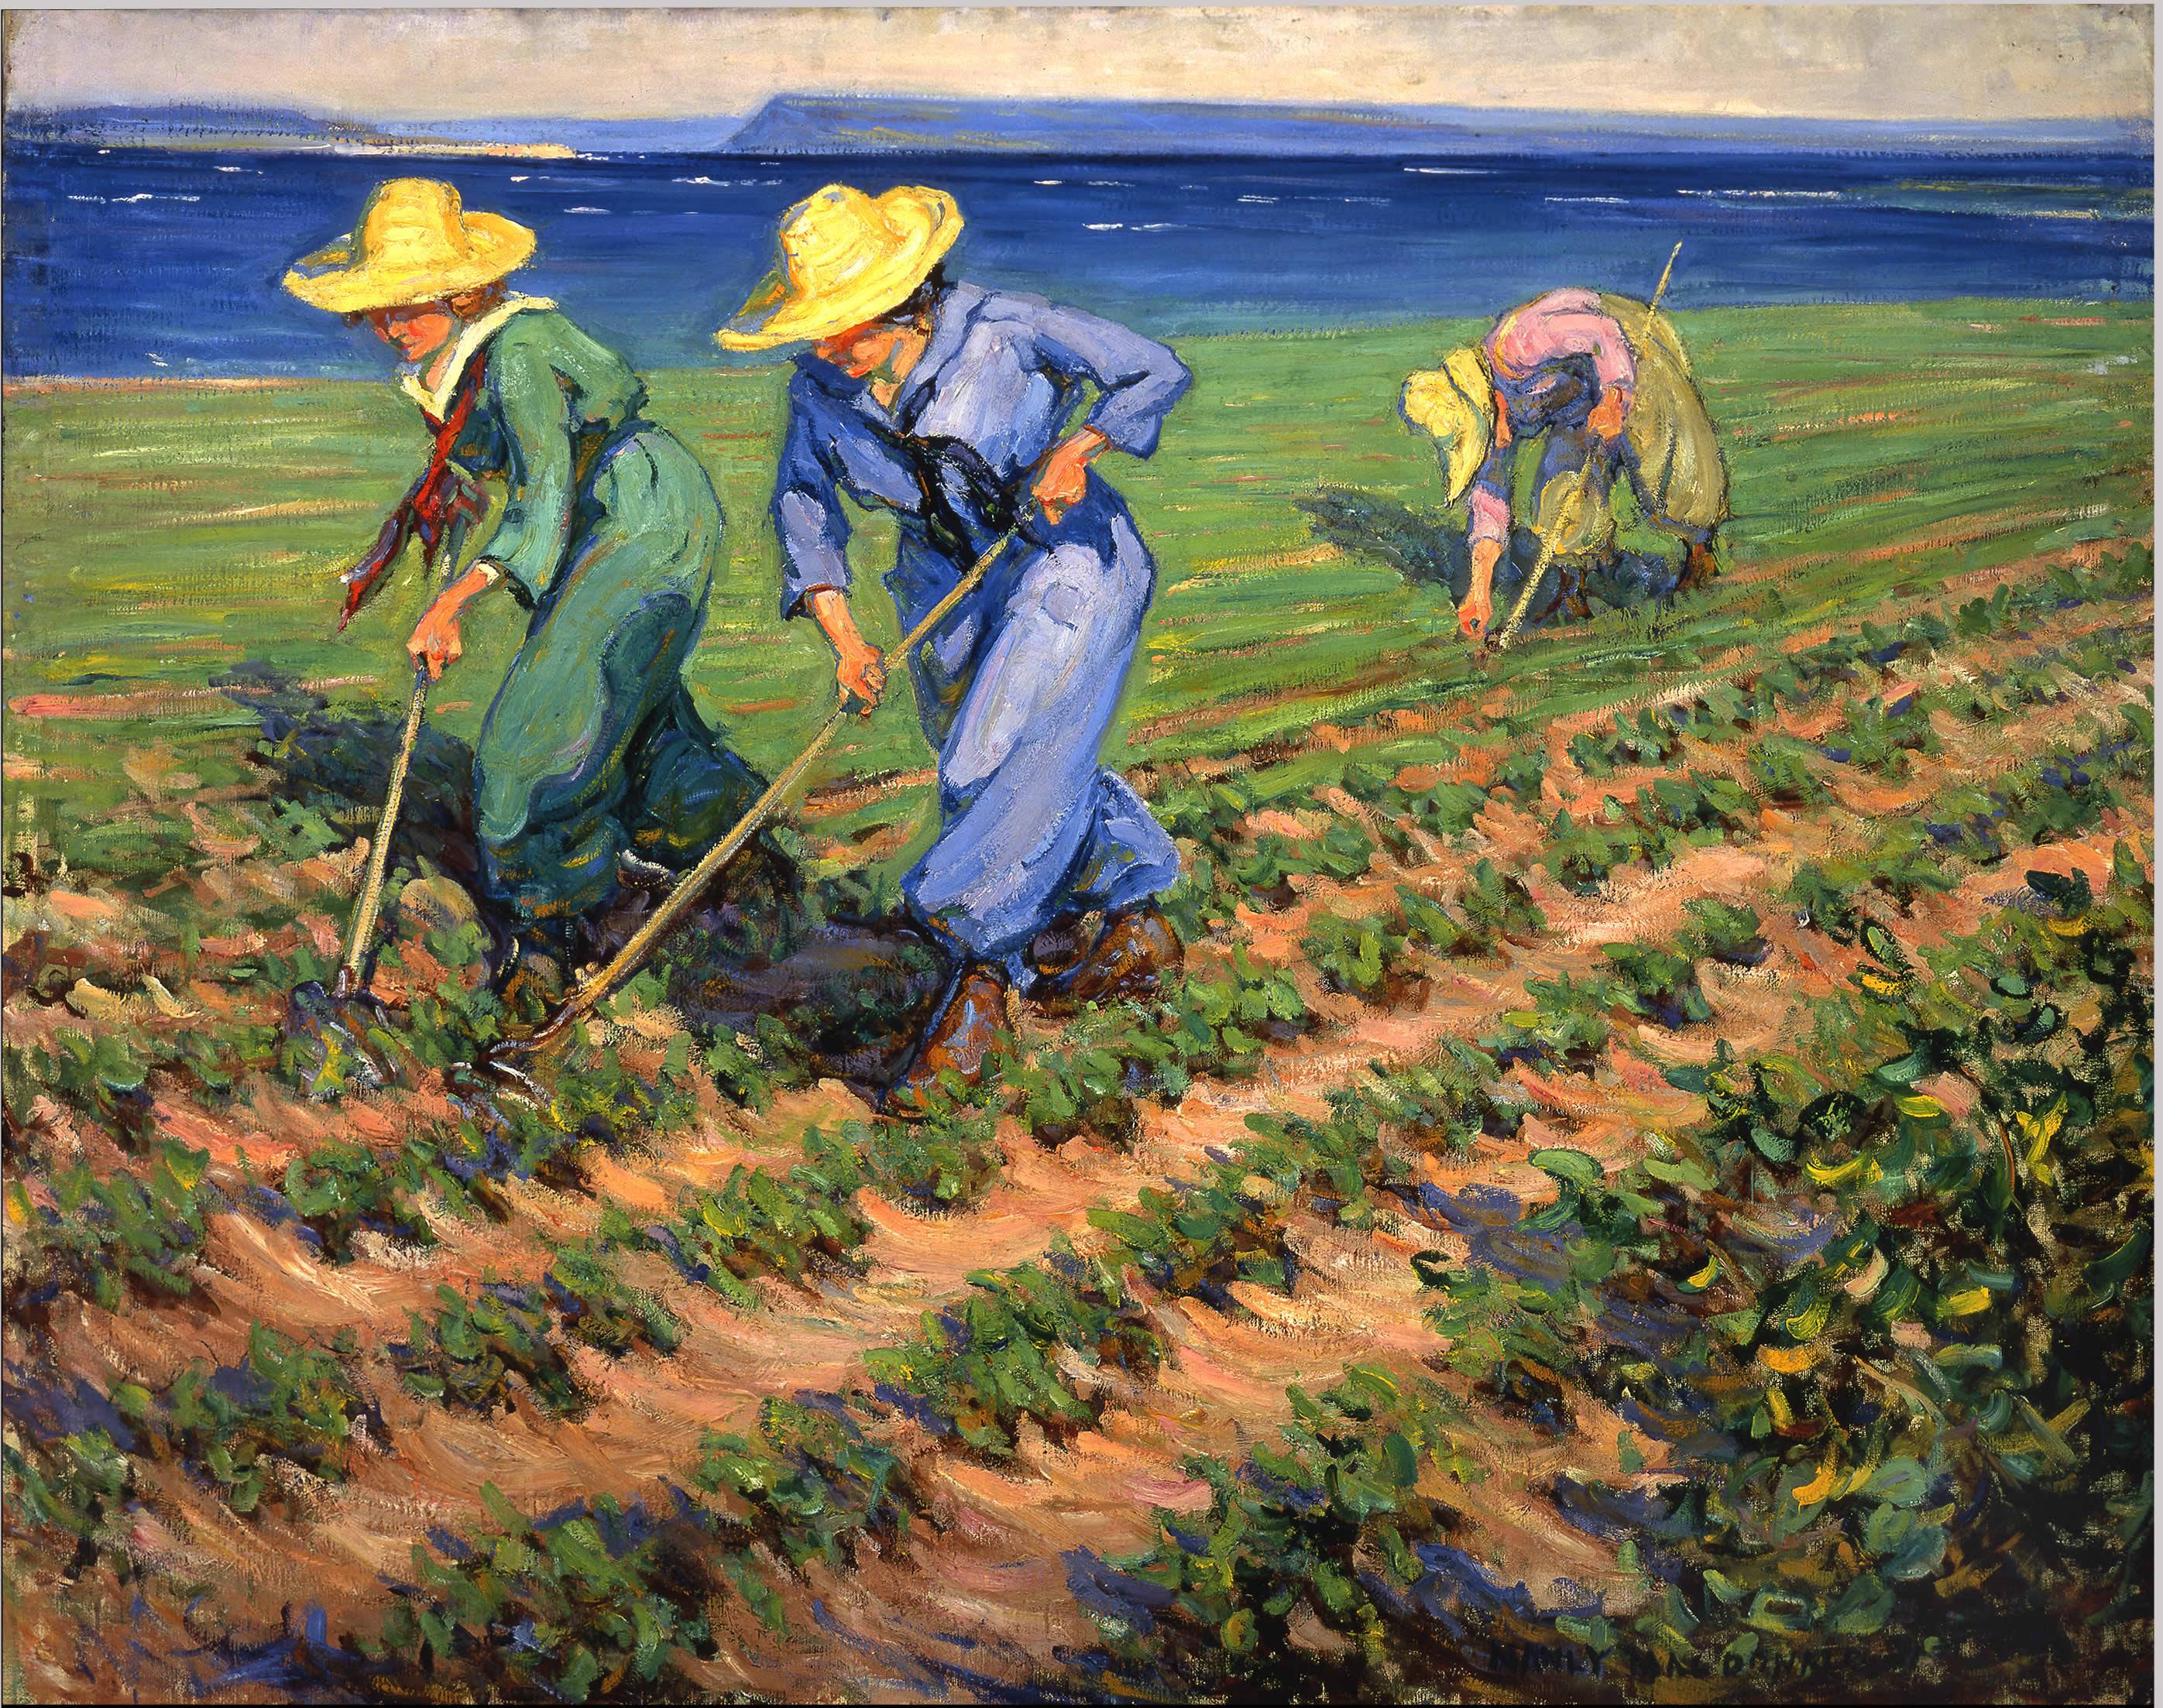 <i>Ouvrières agricoles binant</i>